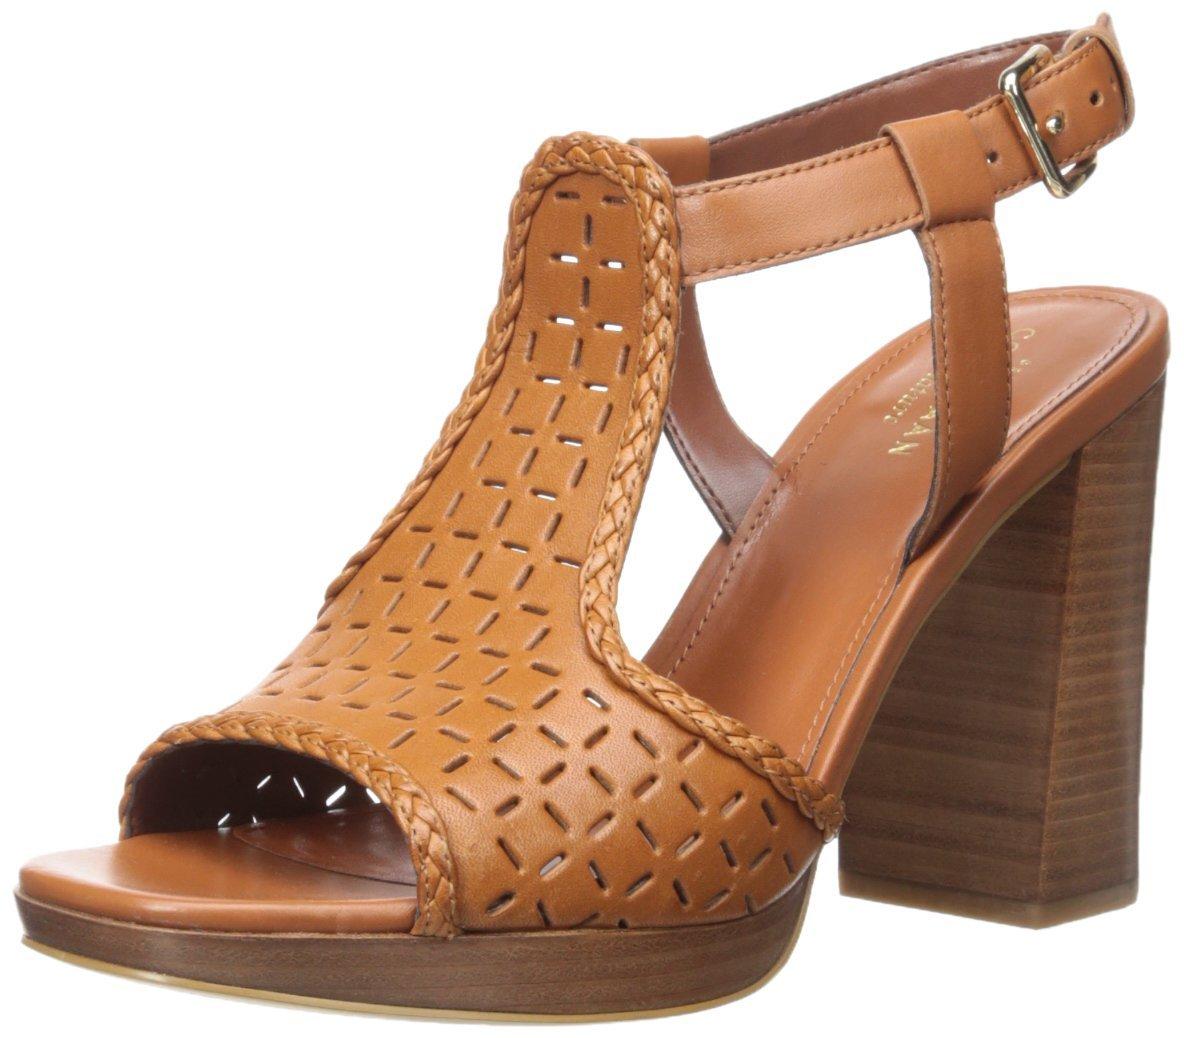 Cole Haan Women's Elettra High Platform Dress Sandal B015Q31QV2 11 B(M) US|Acorn